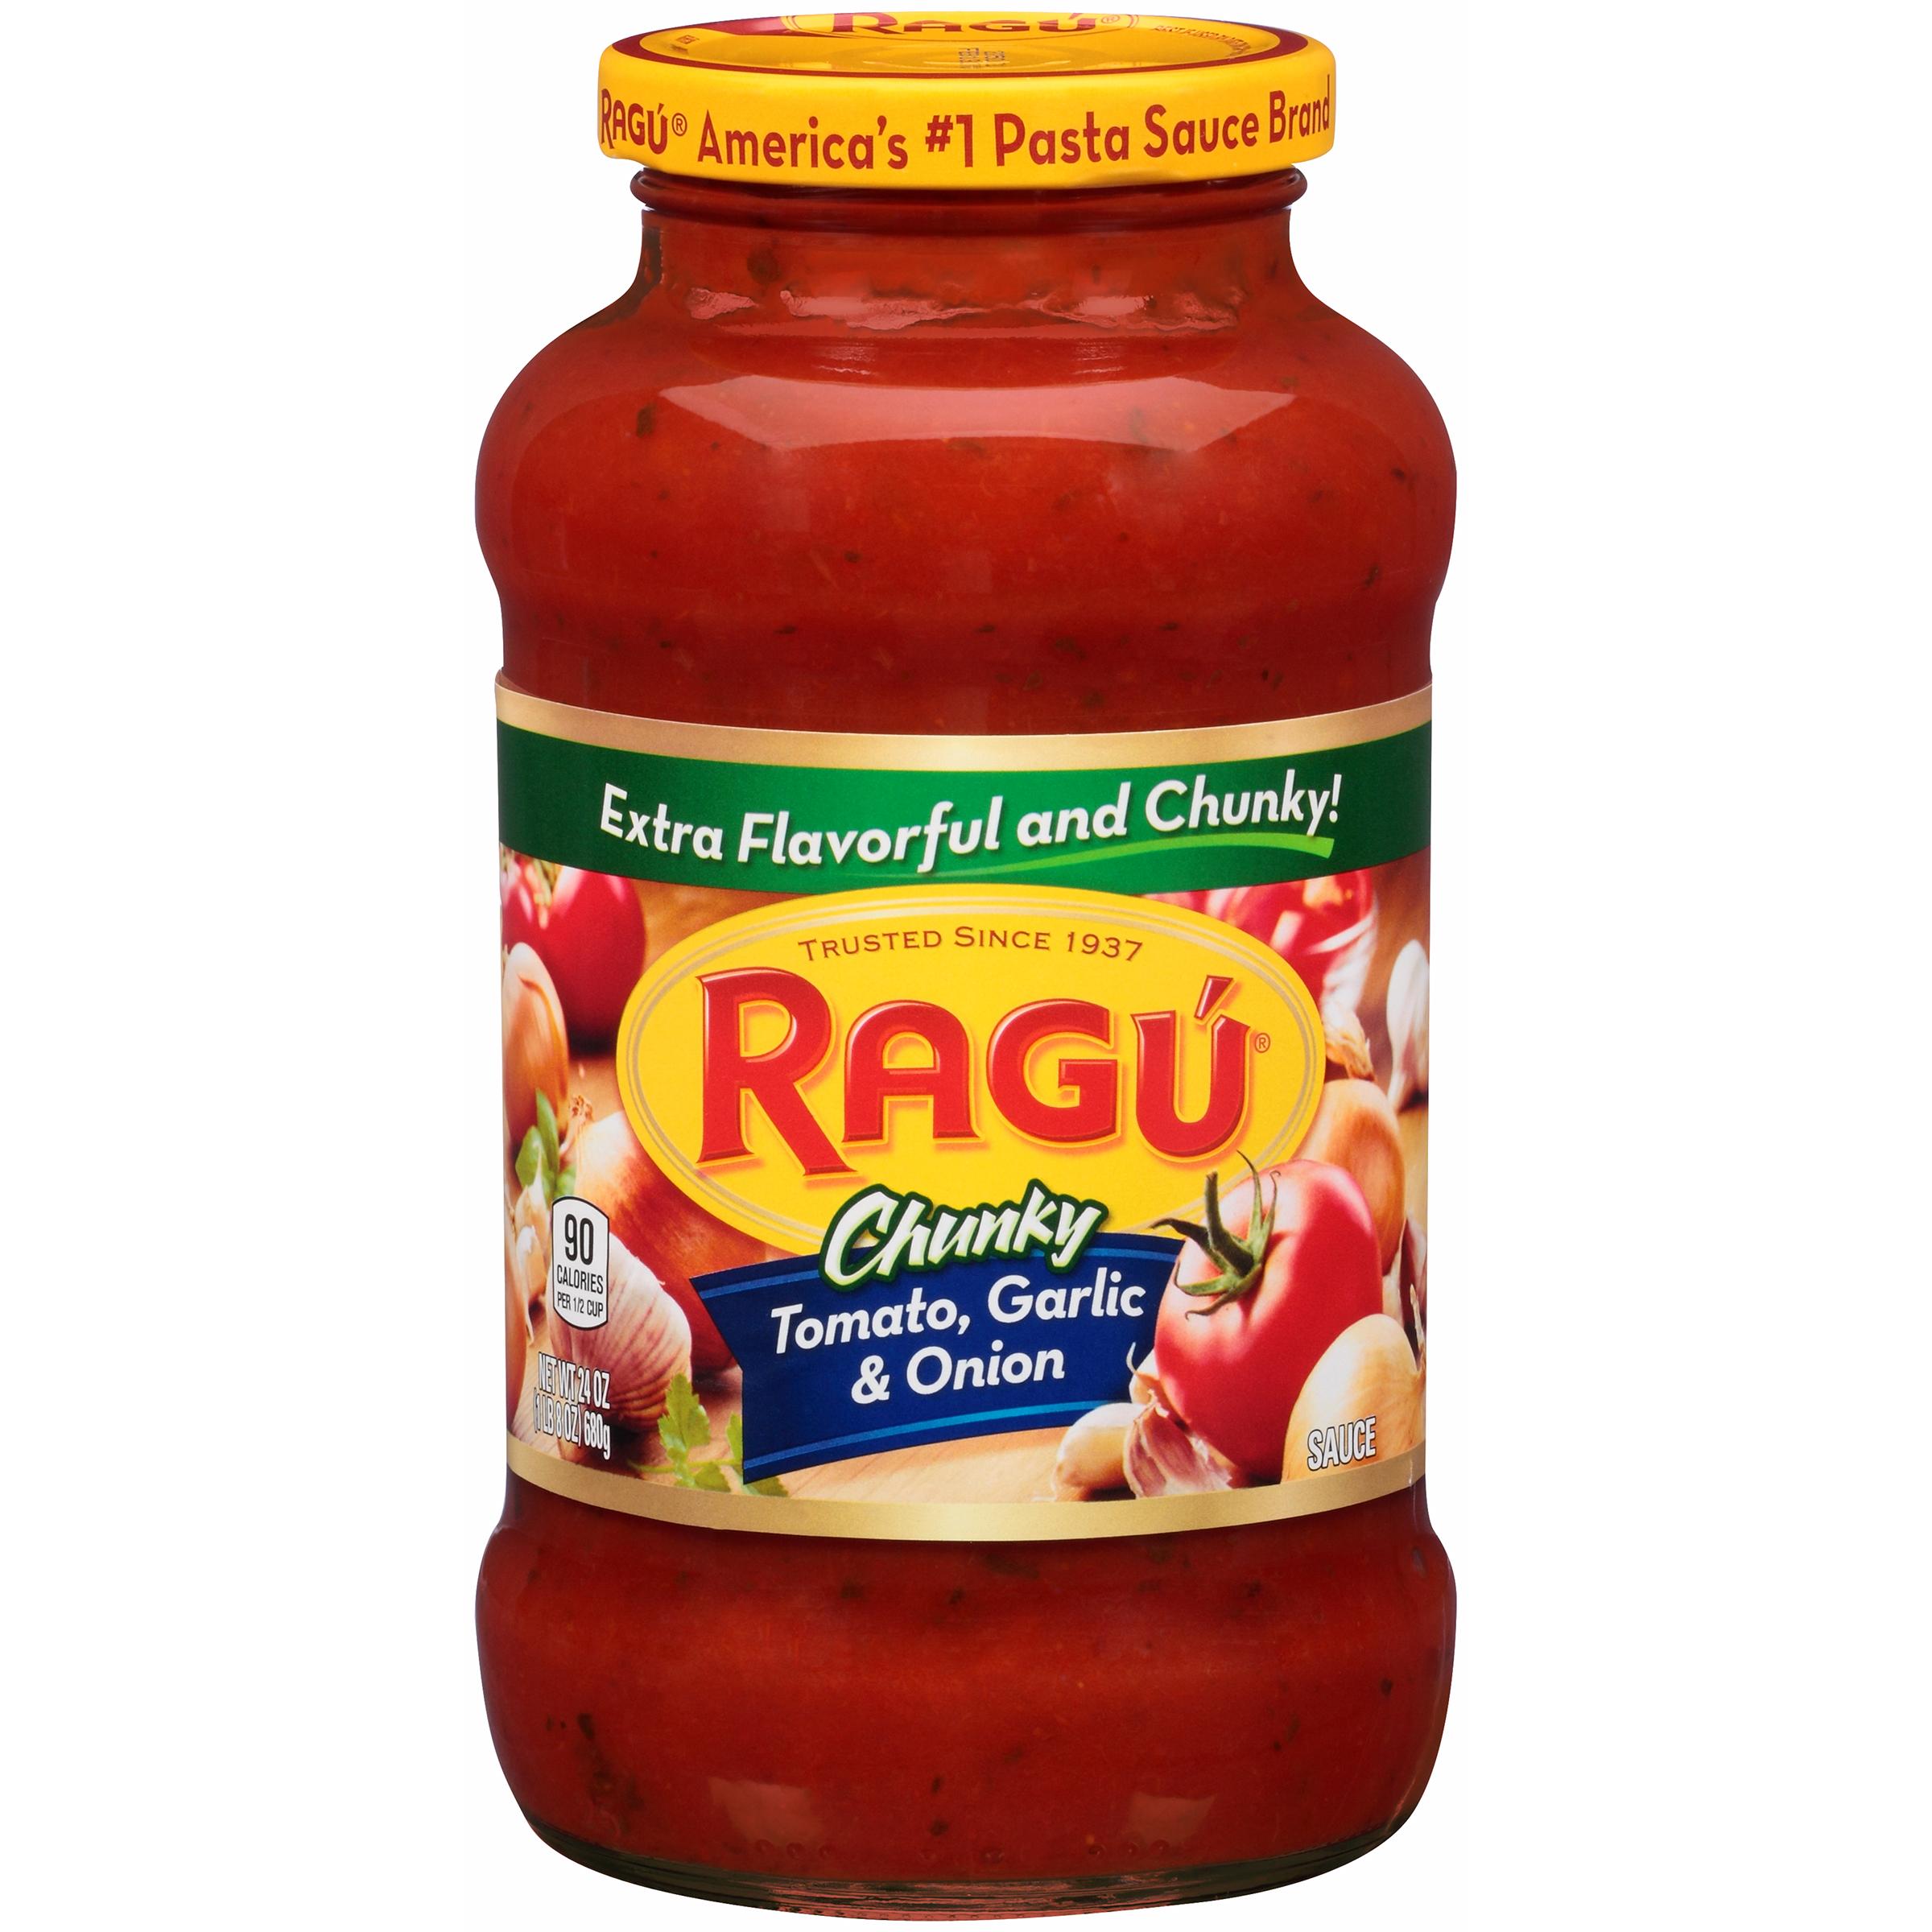 Ragu Chunky Pasta Sauce Tomato Garlic Onion 26 oz 1